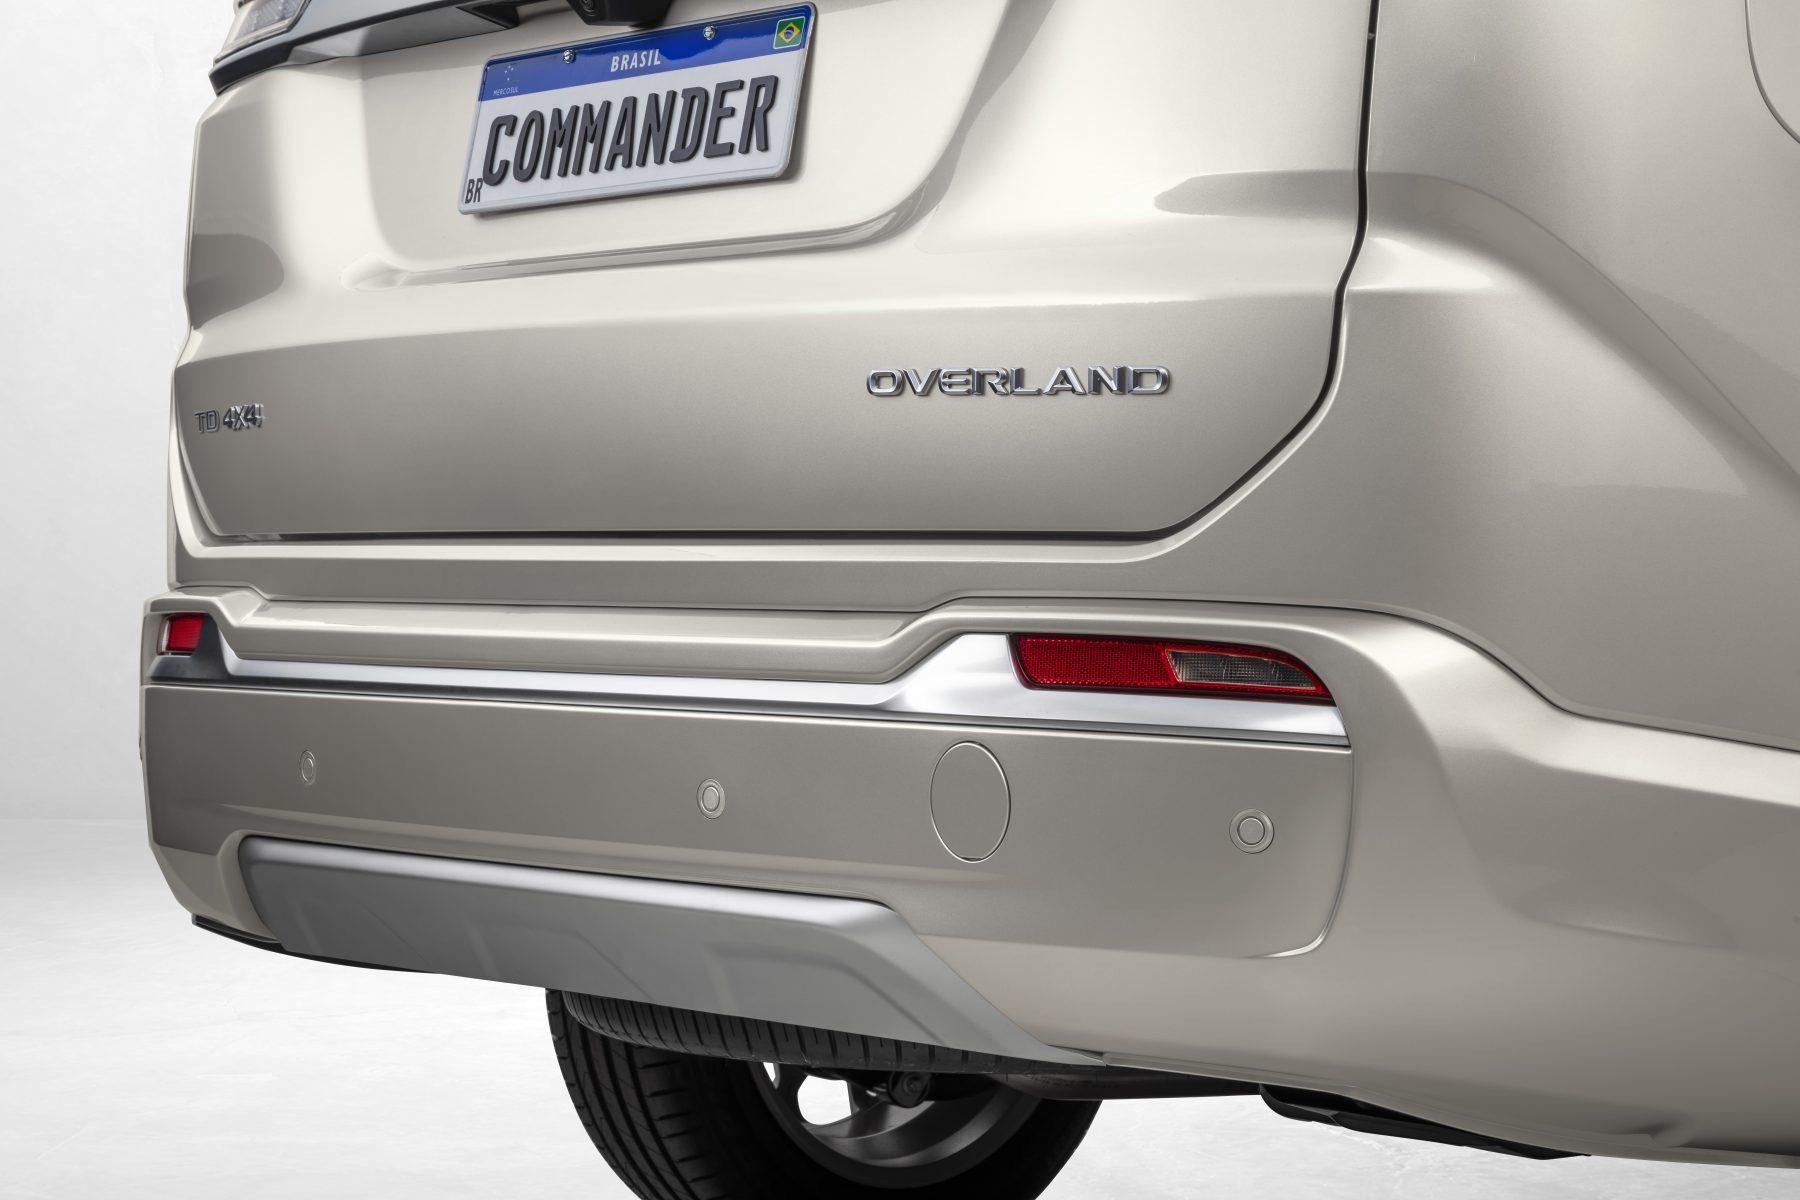 jeep commander overland td380 44